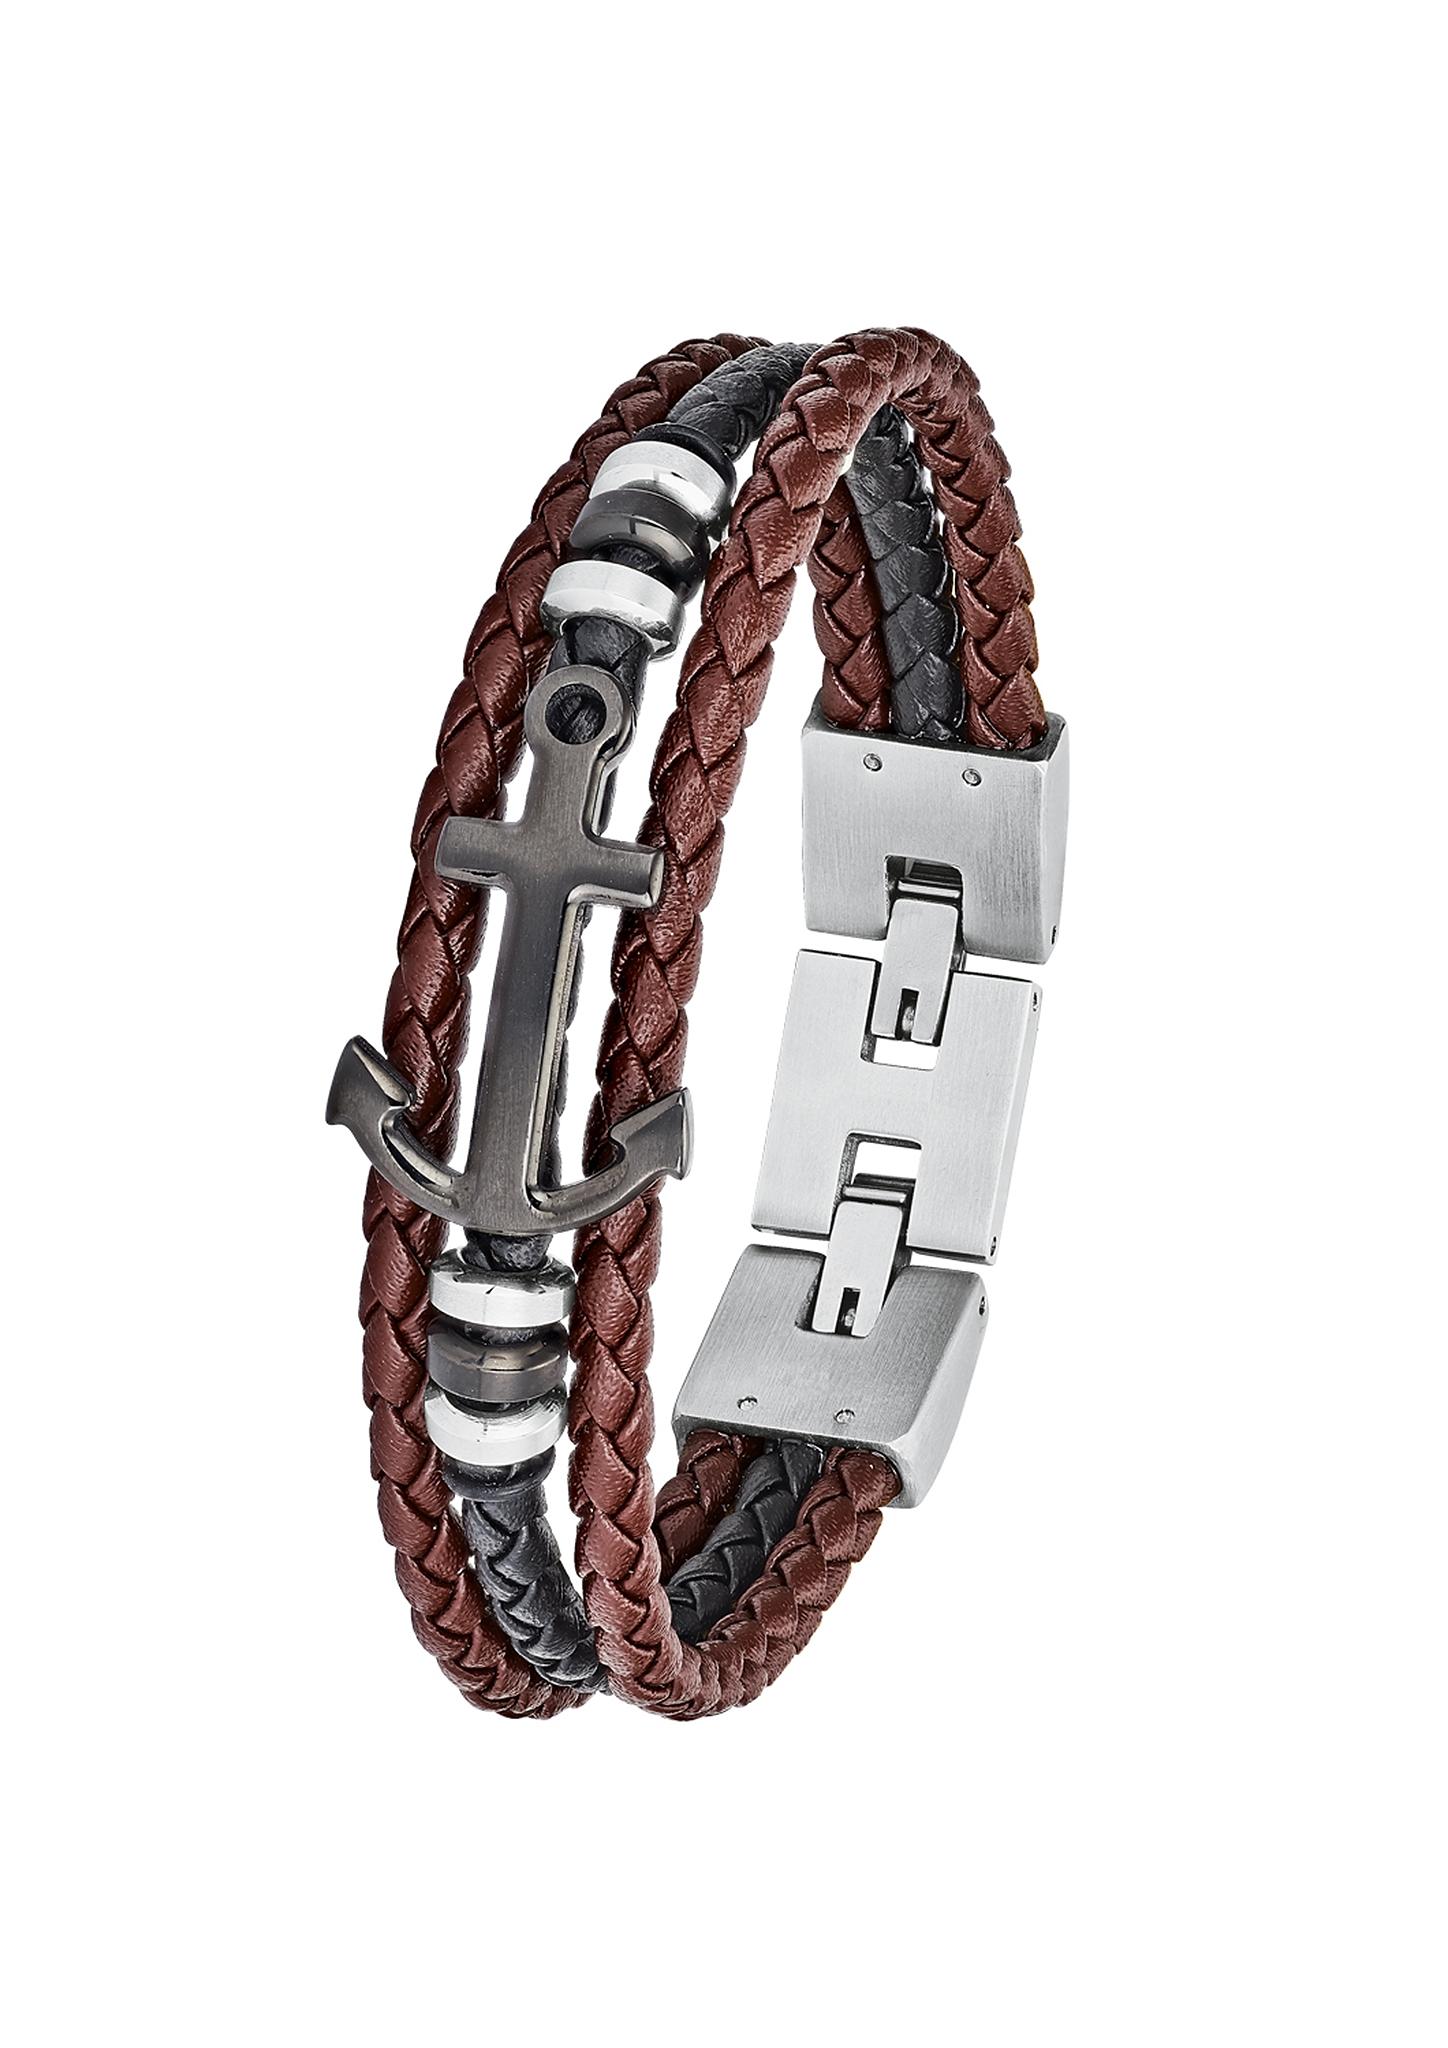 Armband | Schmuck > Armbänder | Brown | silver | Edelstahl| ip black | s.Oliver